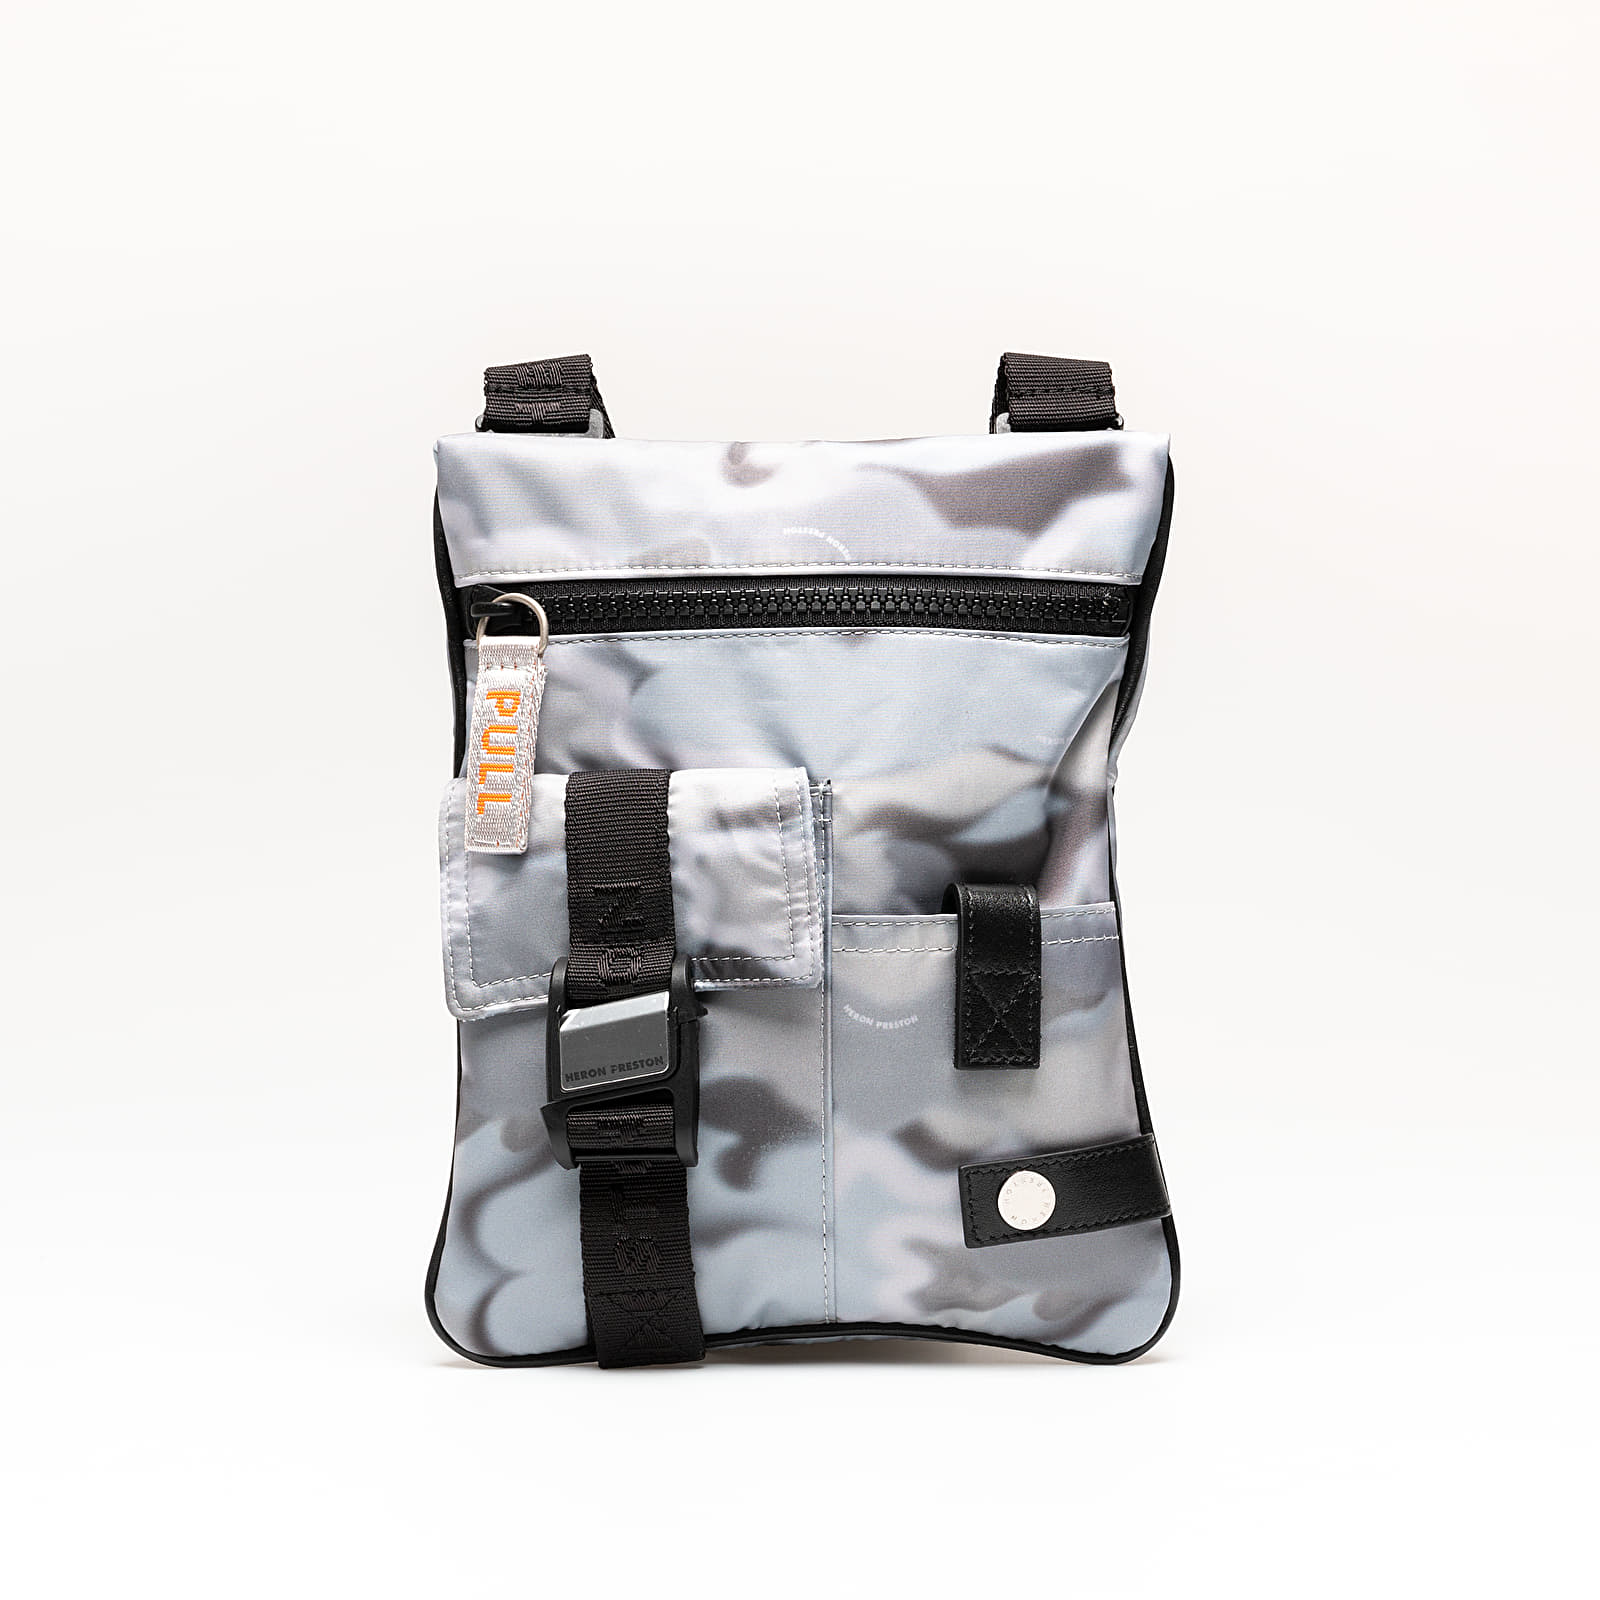 Genți de umăr HERON PRESTON Crossbody Bag Camo Multicolor